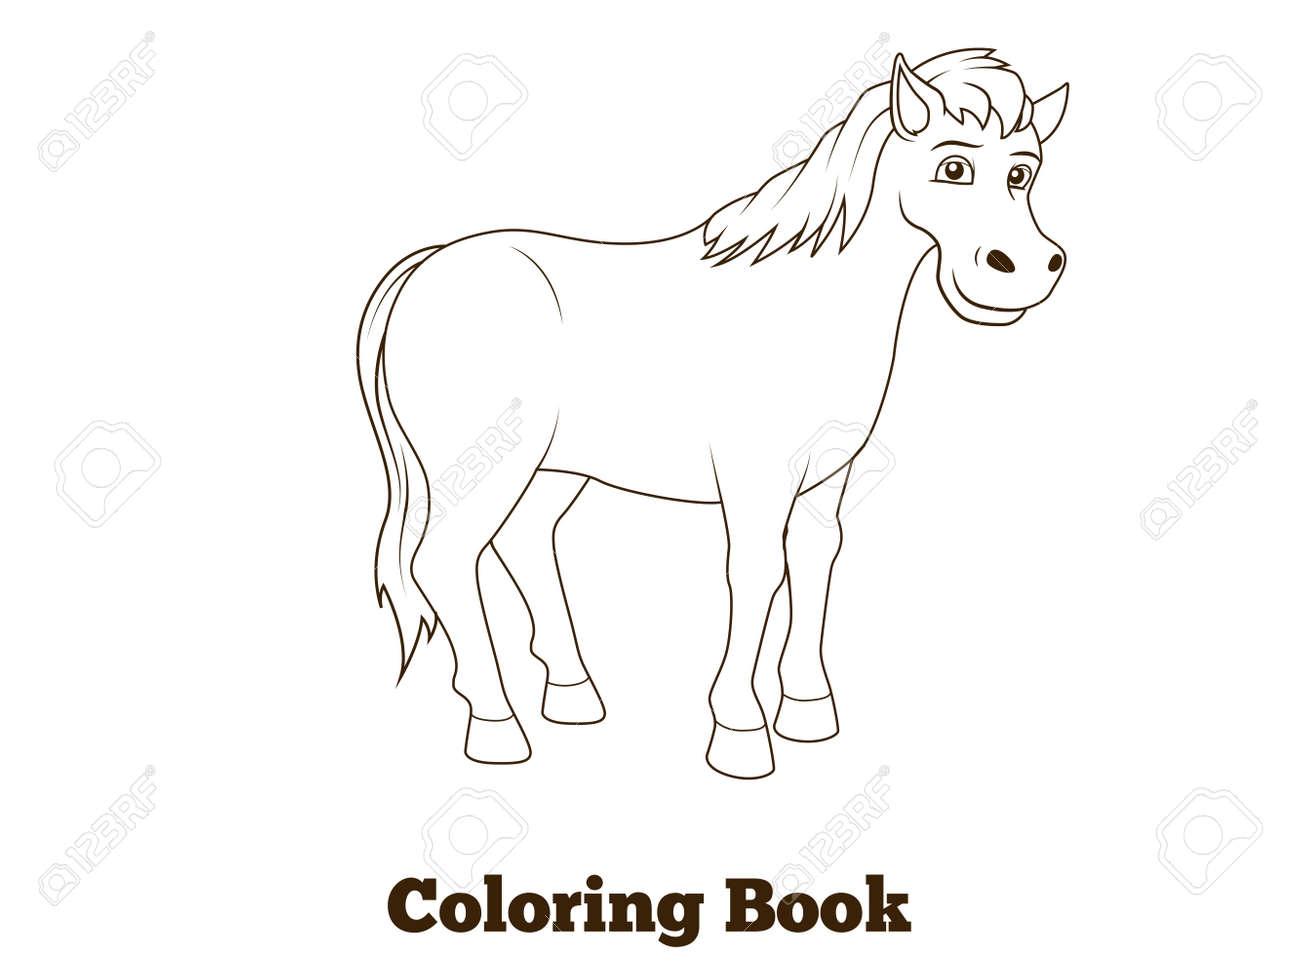 Ilustracion Vectorial Educativa Caballo De Libro Para Colorear De